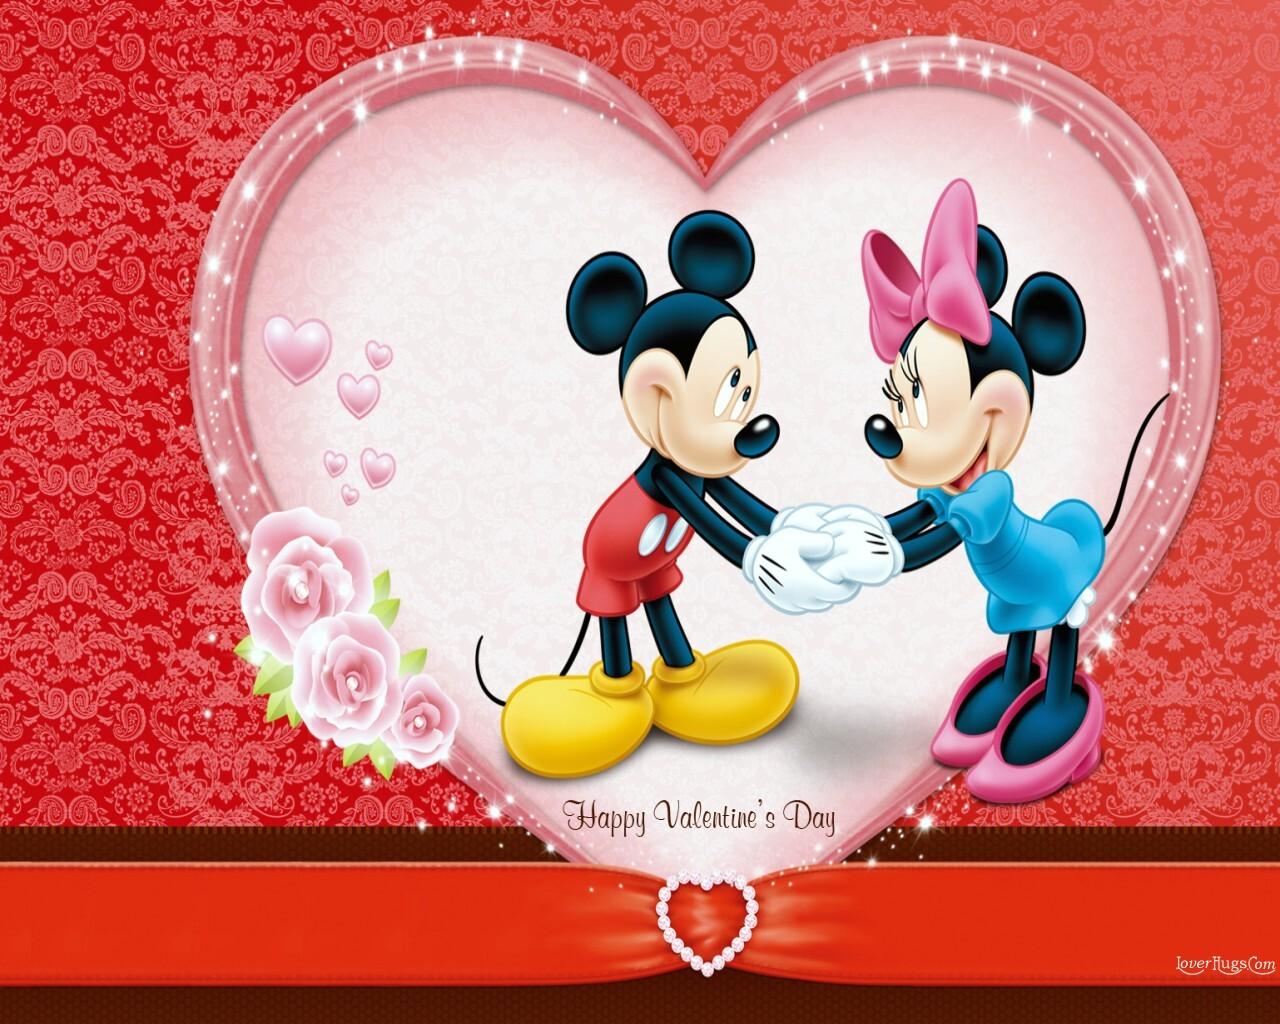 http://1.bp.blogspot.com/-xYkxl2ojUhw/TVSSHxlchNI/AAAAAAAABiQ/JoTSBTrztYA/s1600/Disney.jpg